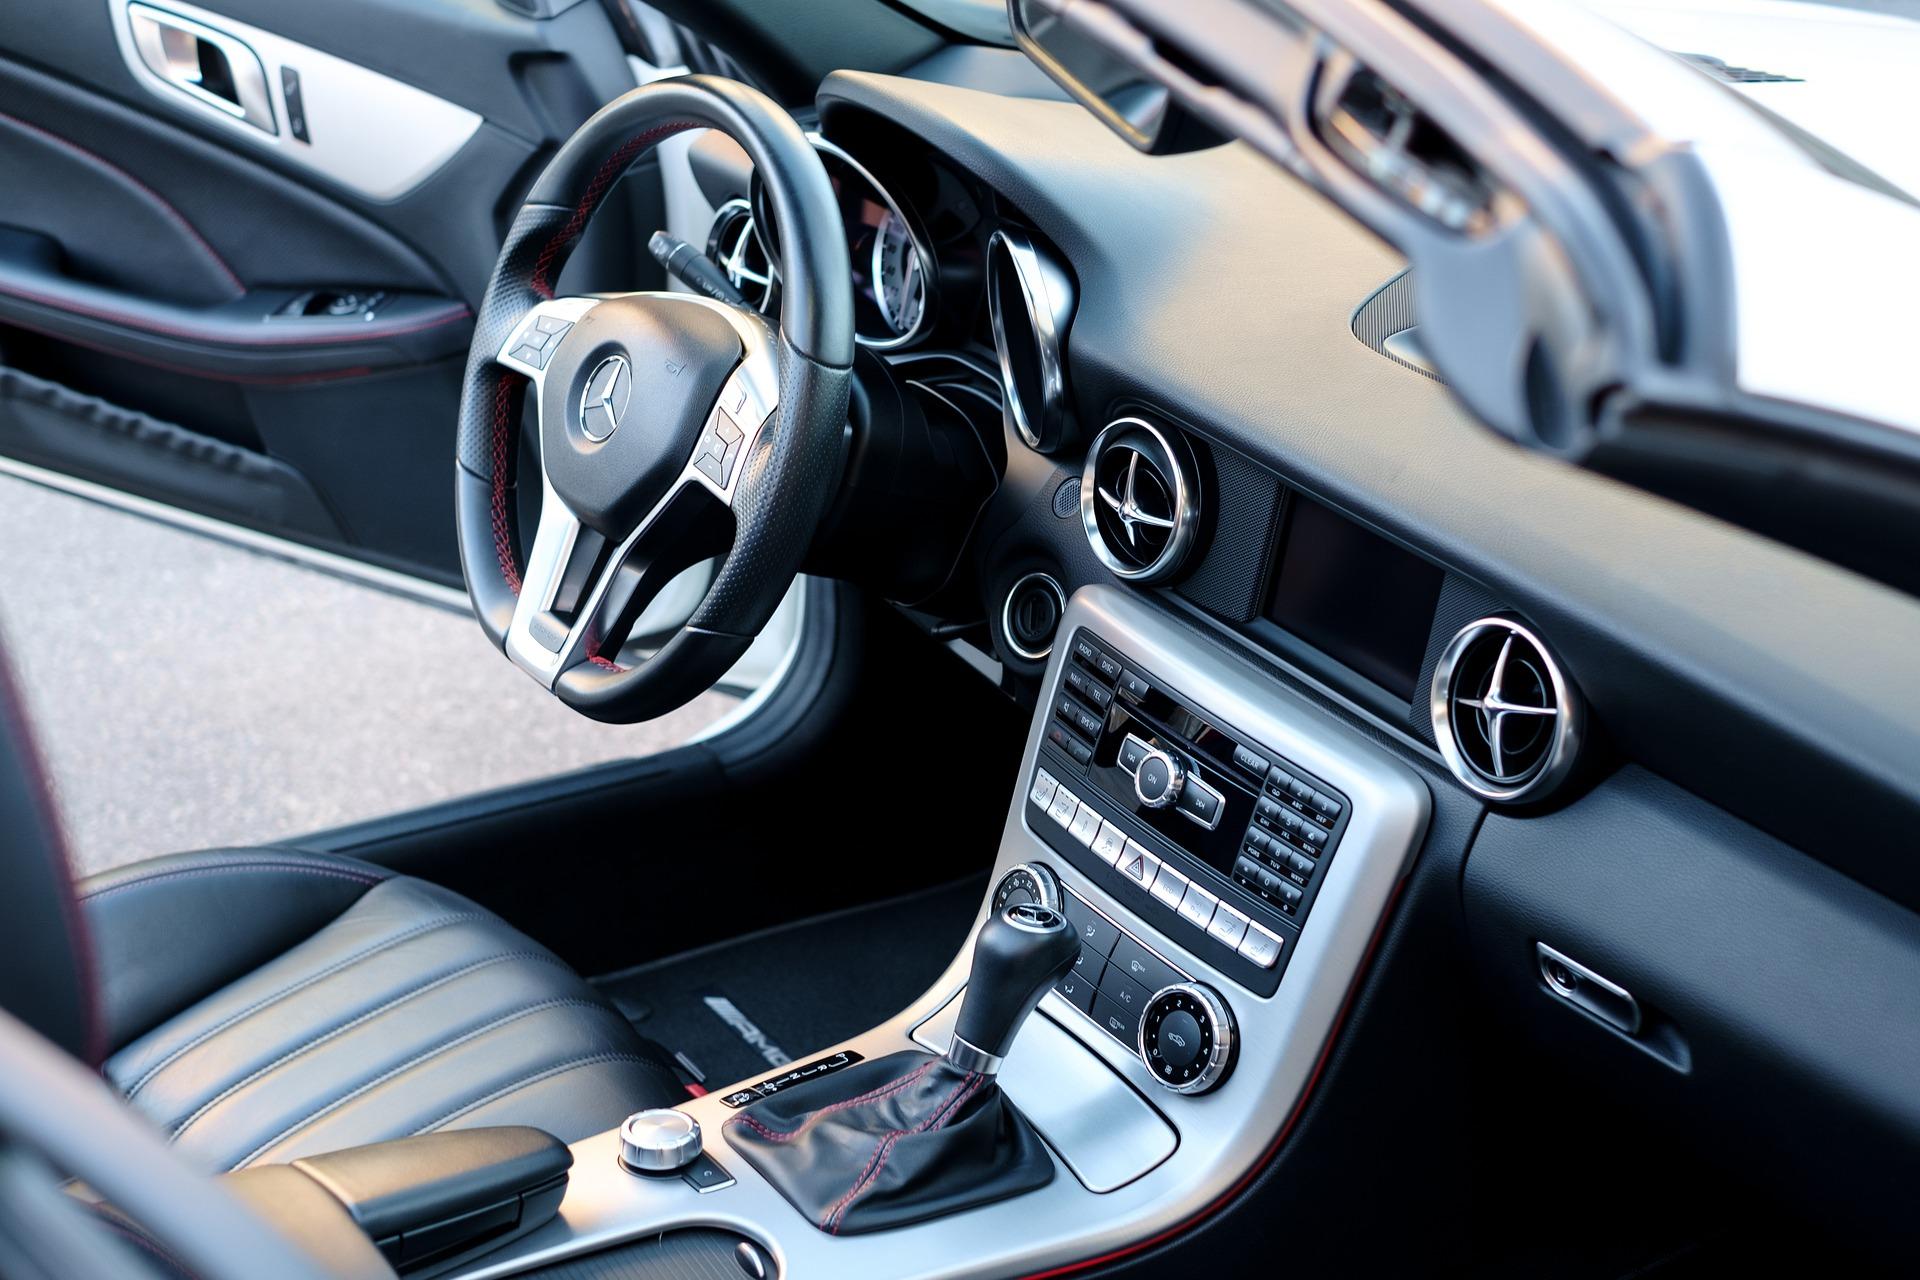 Sparkling clean car interior